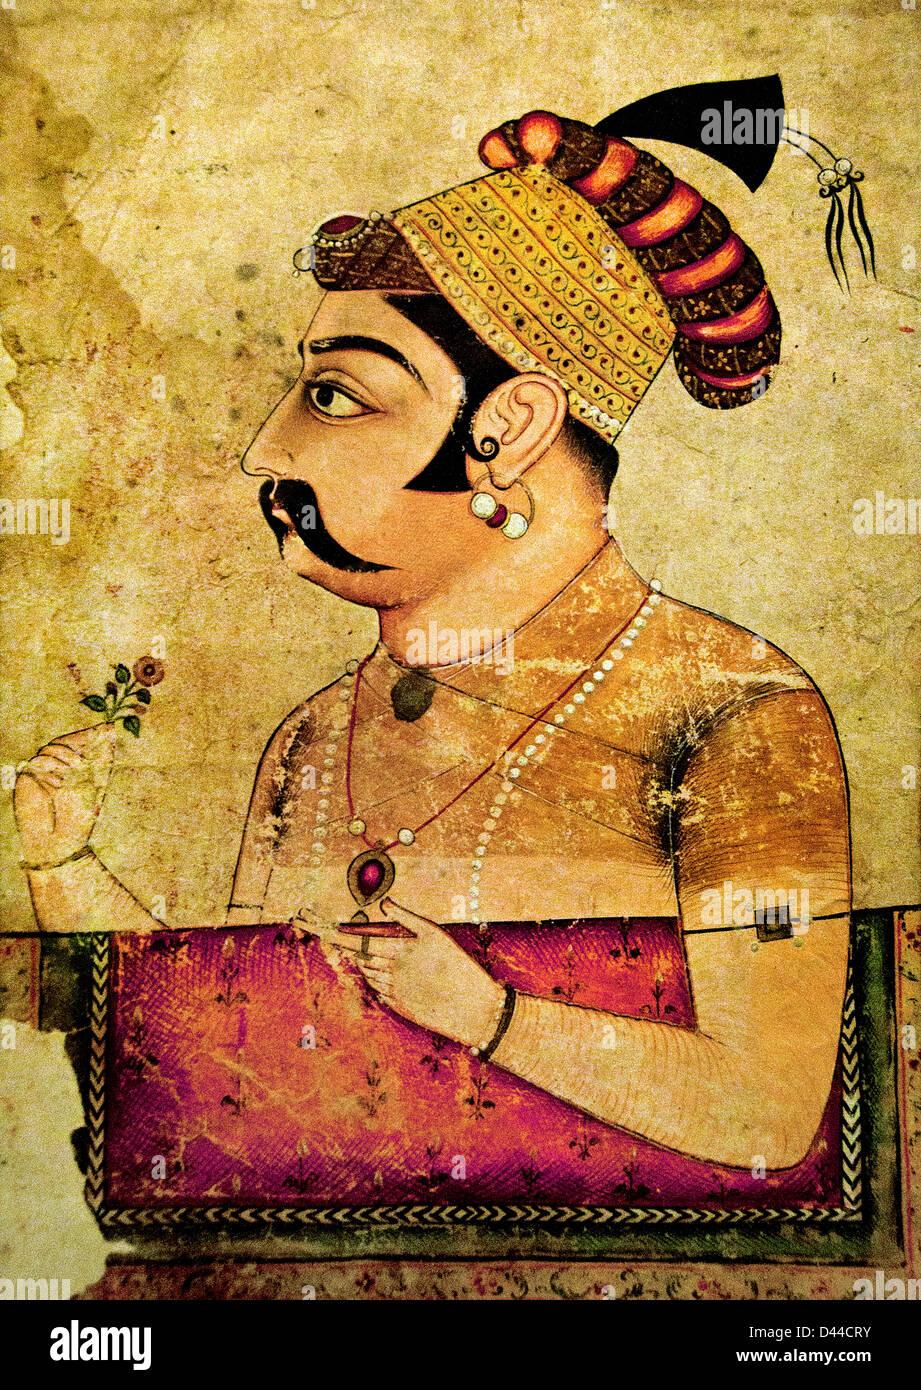 Ritratto di Rao Amar Singh xvii secolo Naguar Rajasthan del Rajasthan in India Immagini Stock